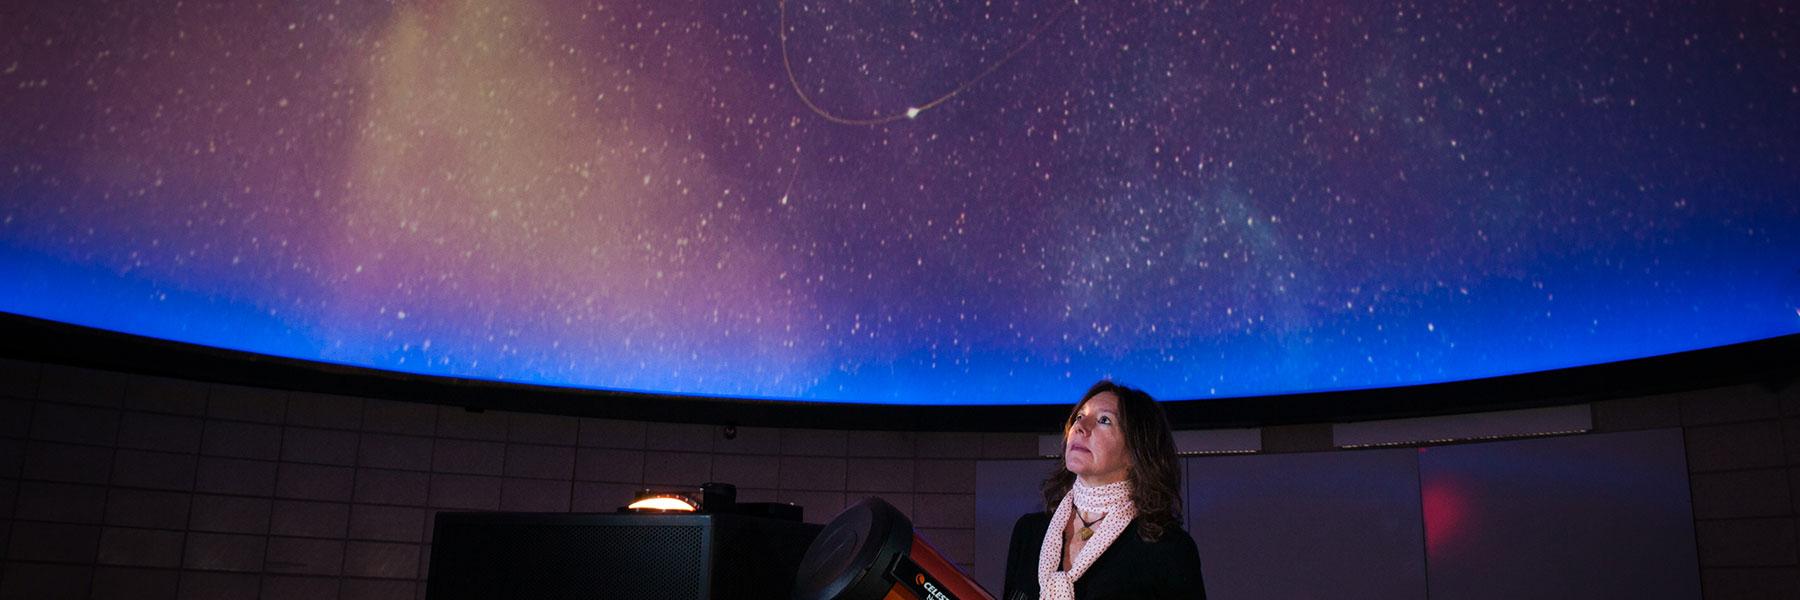 Instructor inside planetarium displaying night sky